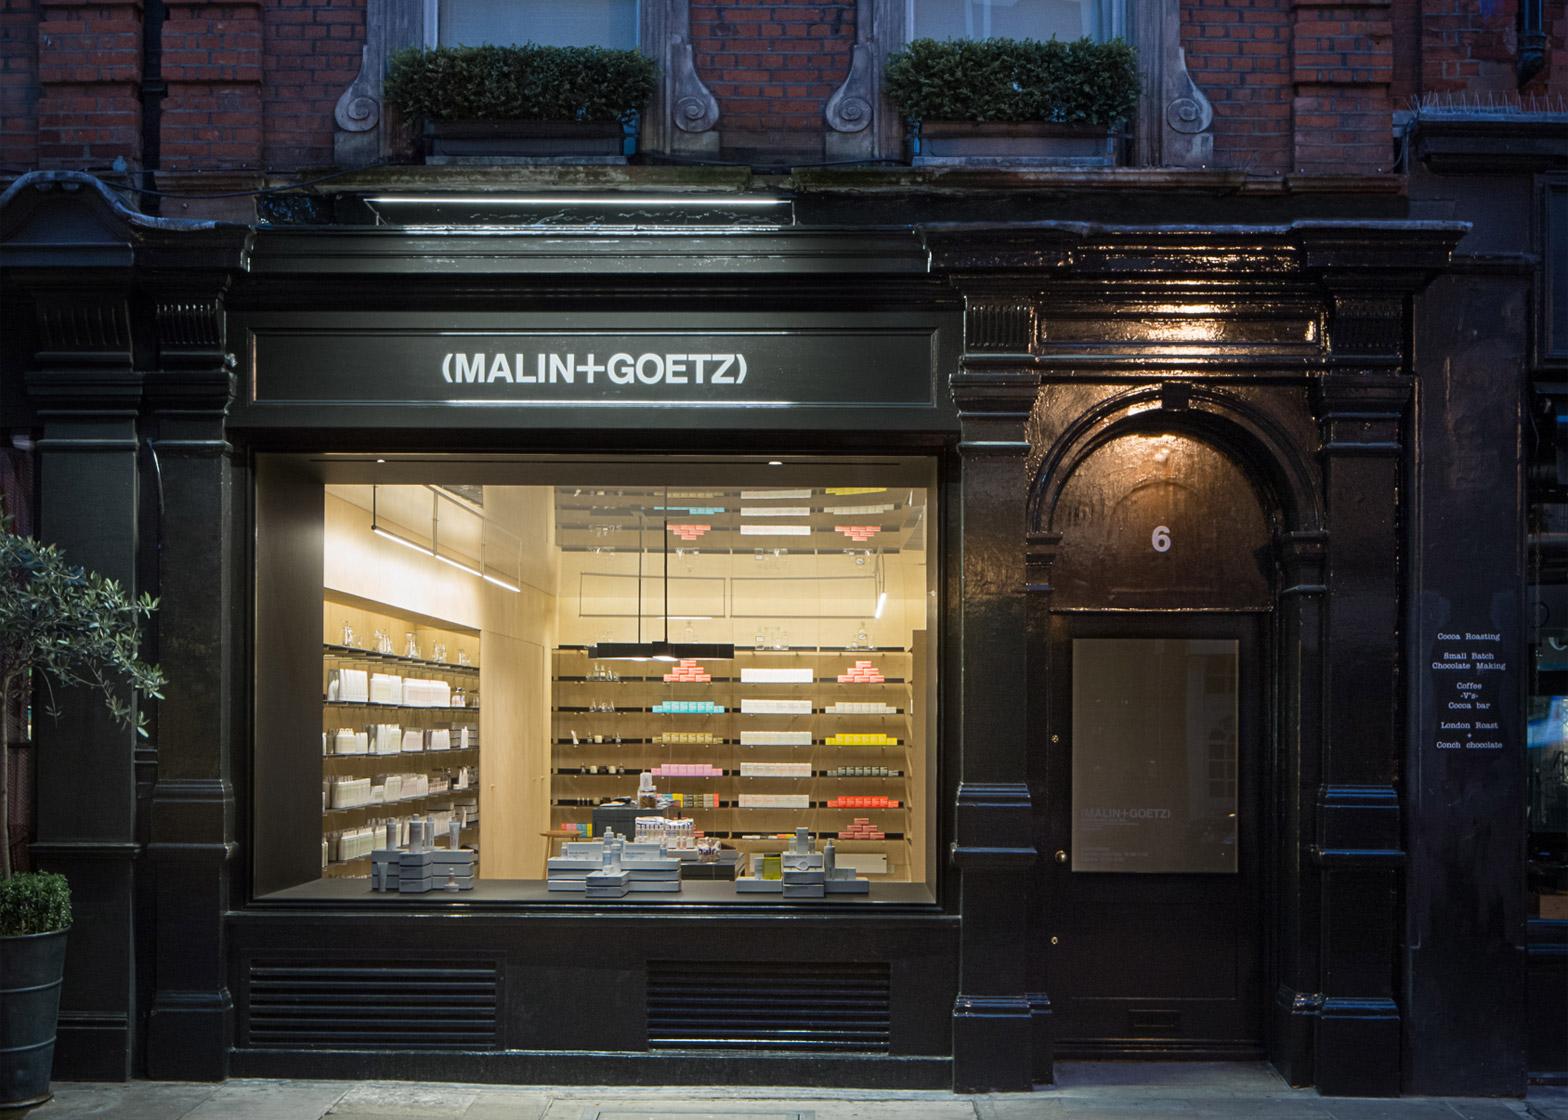 malingoetz-apothecary-shops-jonathan-tuckey-interior-london_dezeen_1568_3